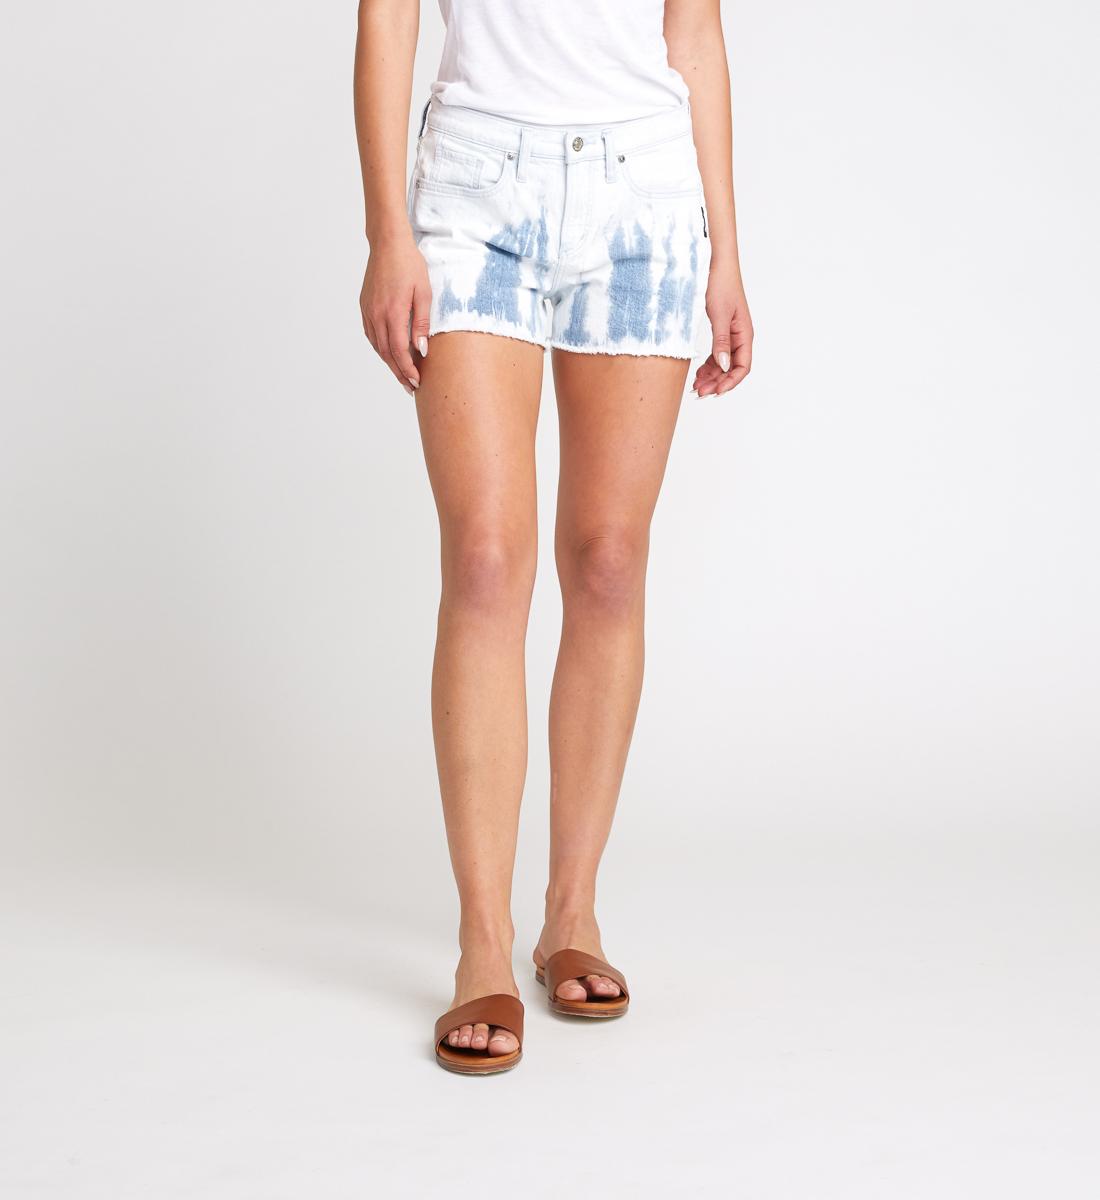 Silver Jeans Not Your Boyfriend'S Shorts